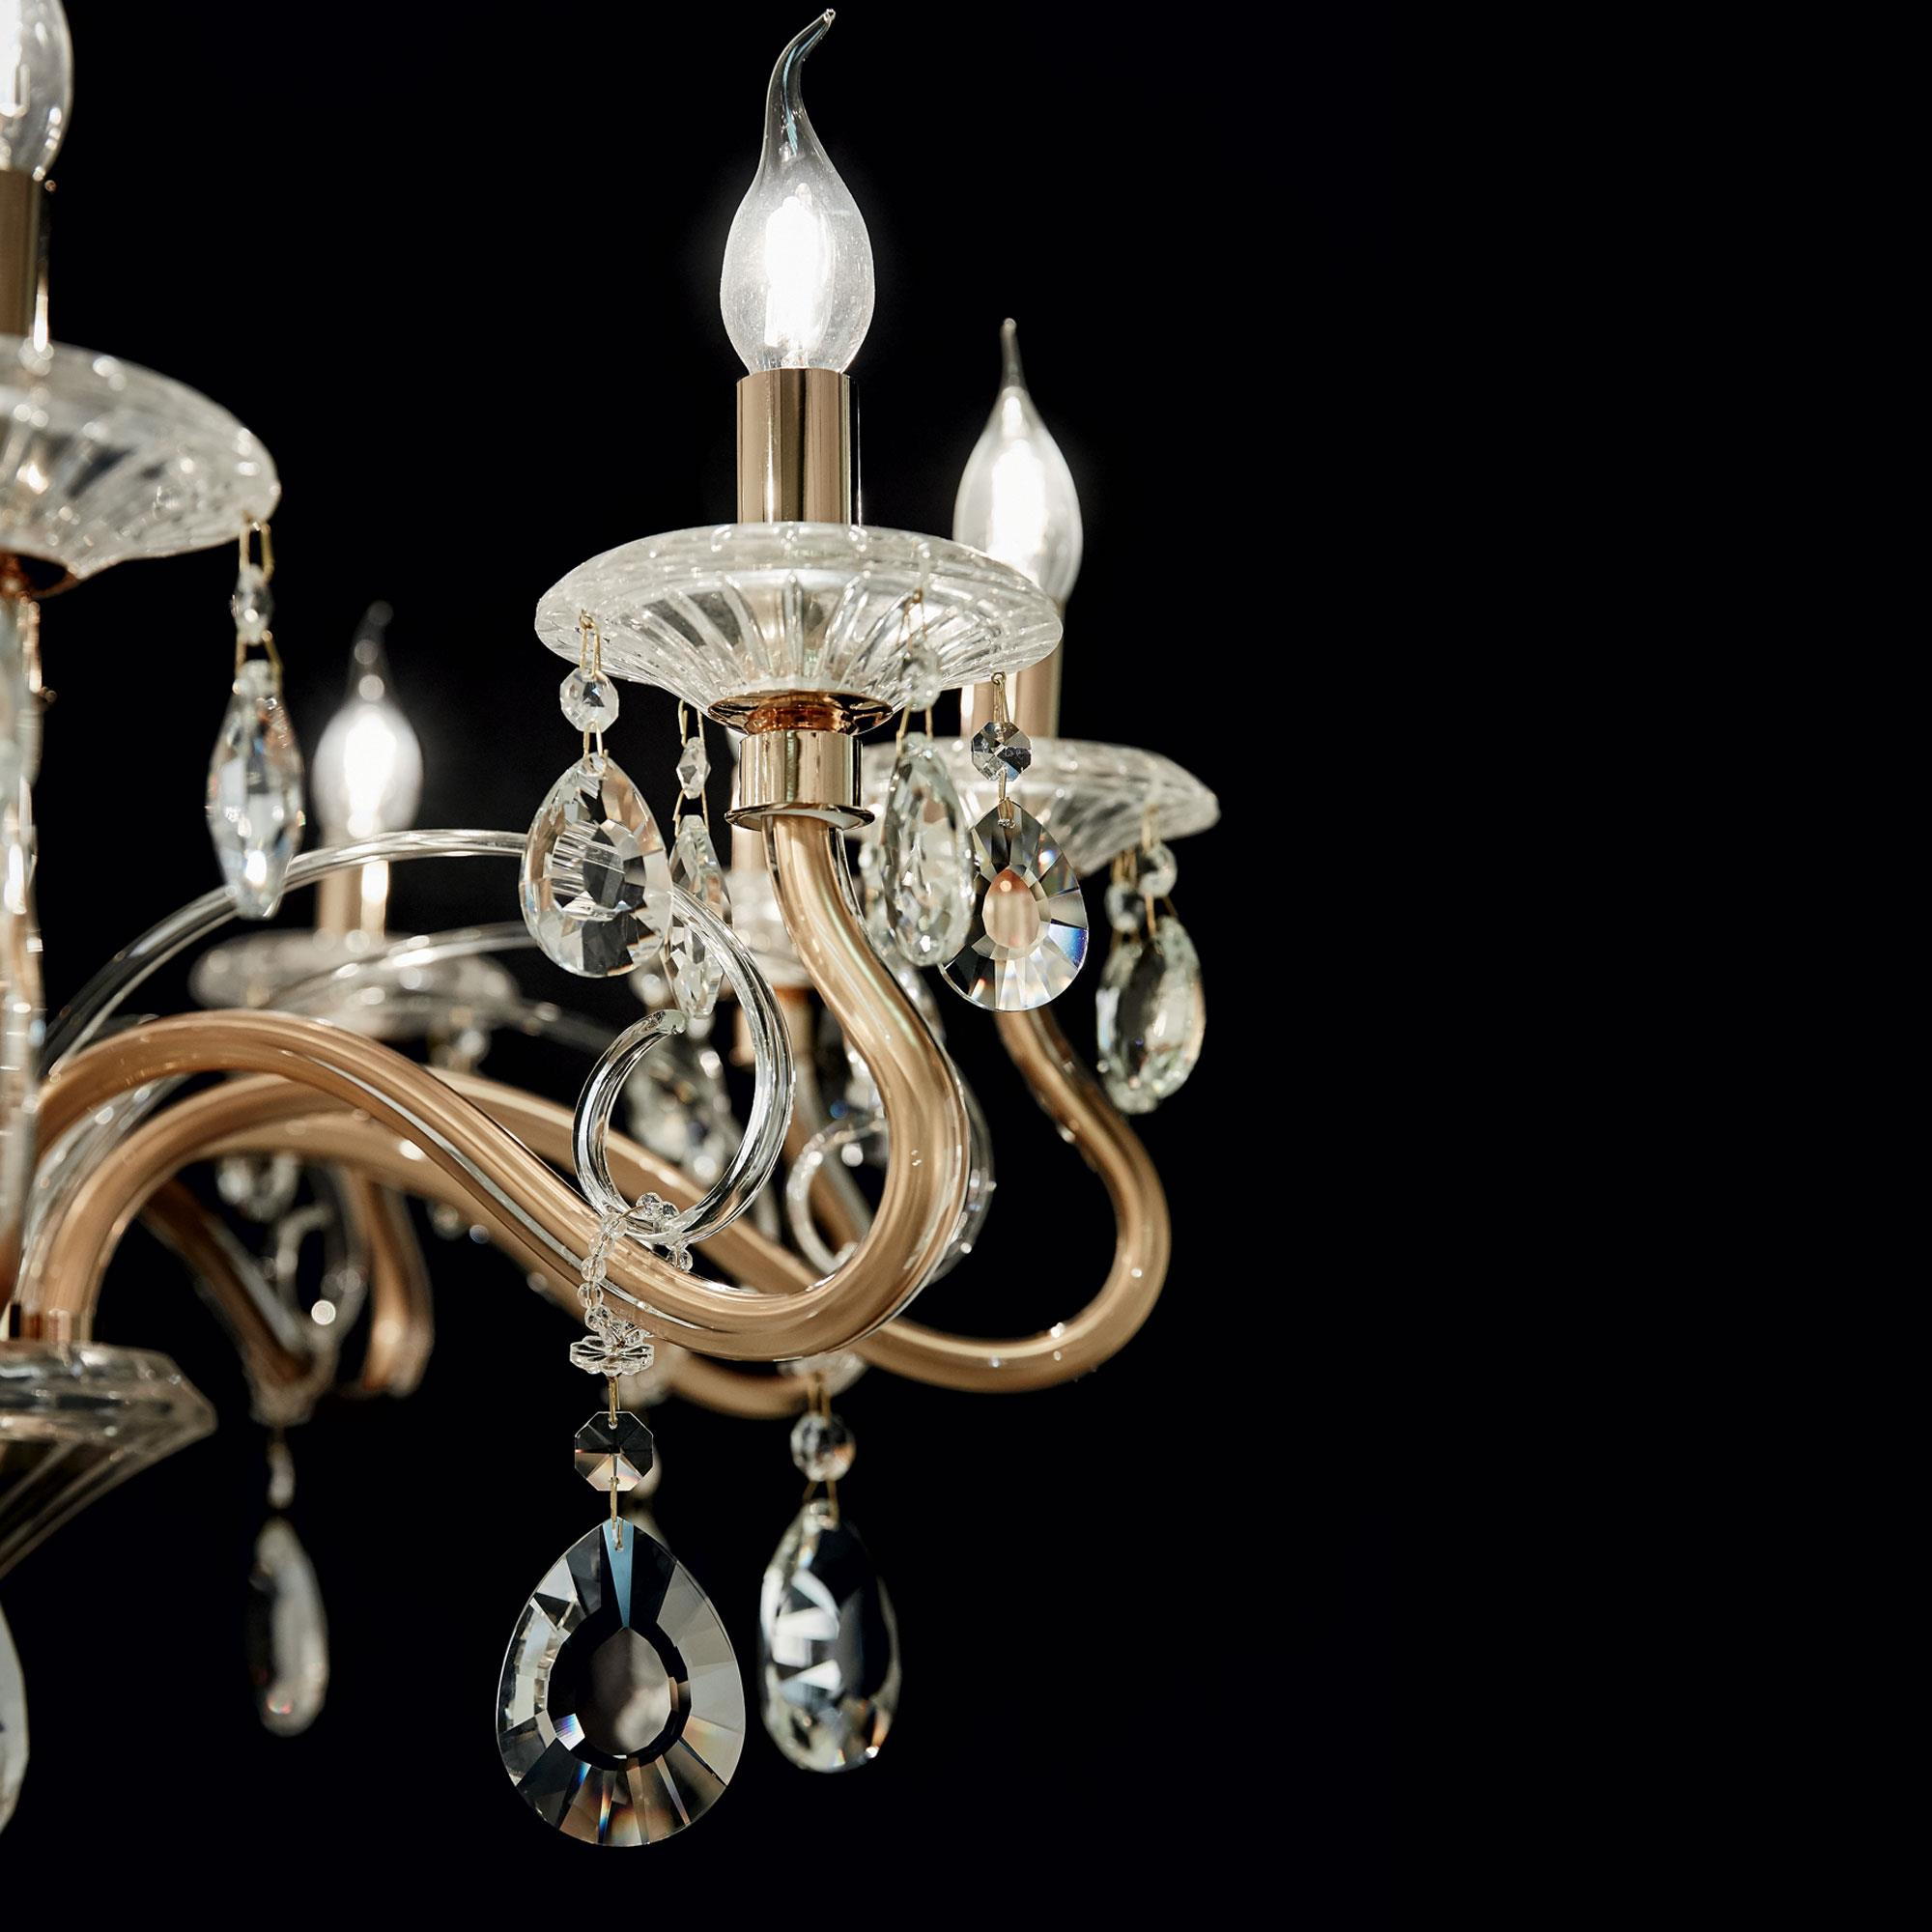 Ideal Lux 087771 Negresco SP10 Oro kristály csillár